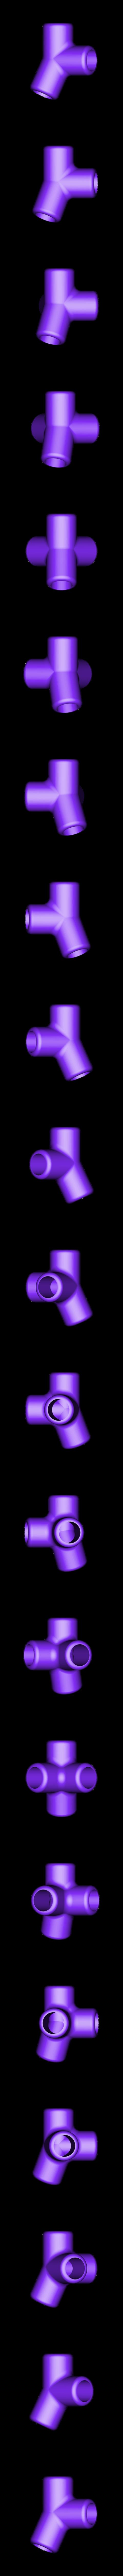 piece_2.stl Download free STL file Picochaise • 3D printer object, PierreR